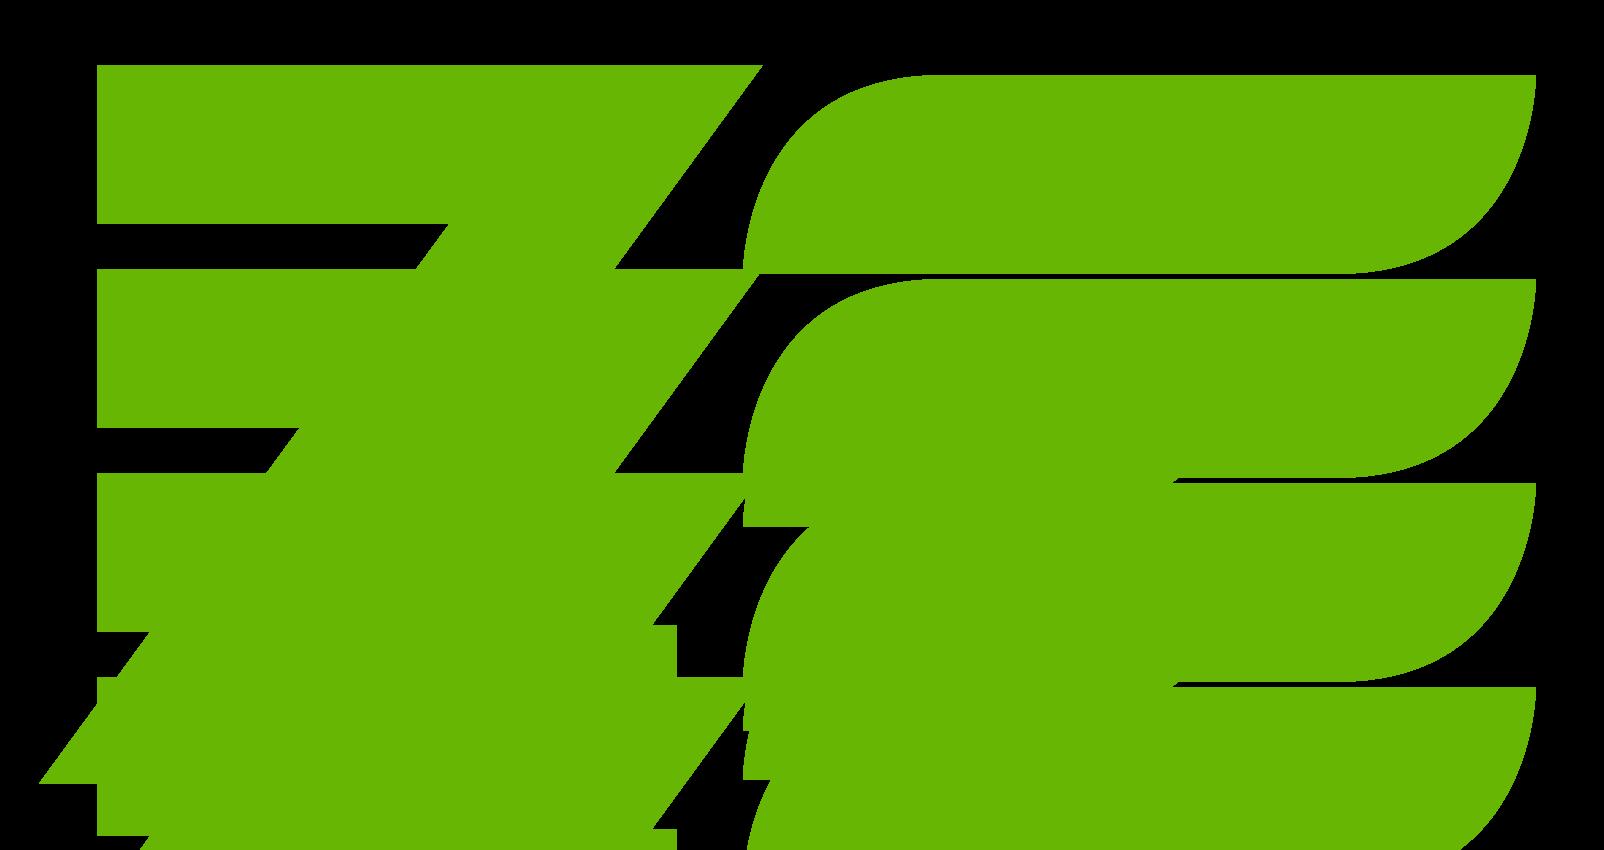 Zend Framework logo